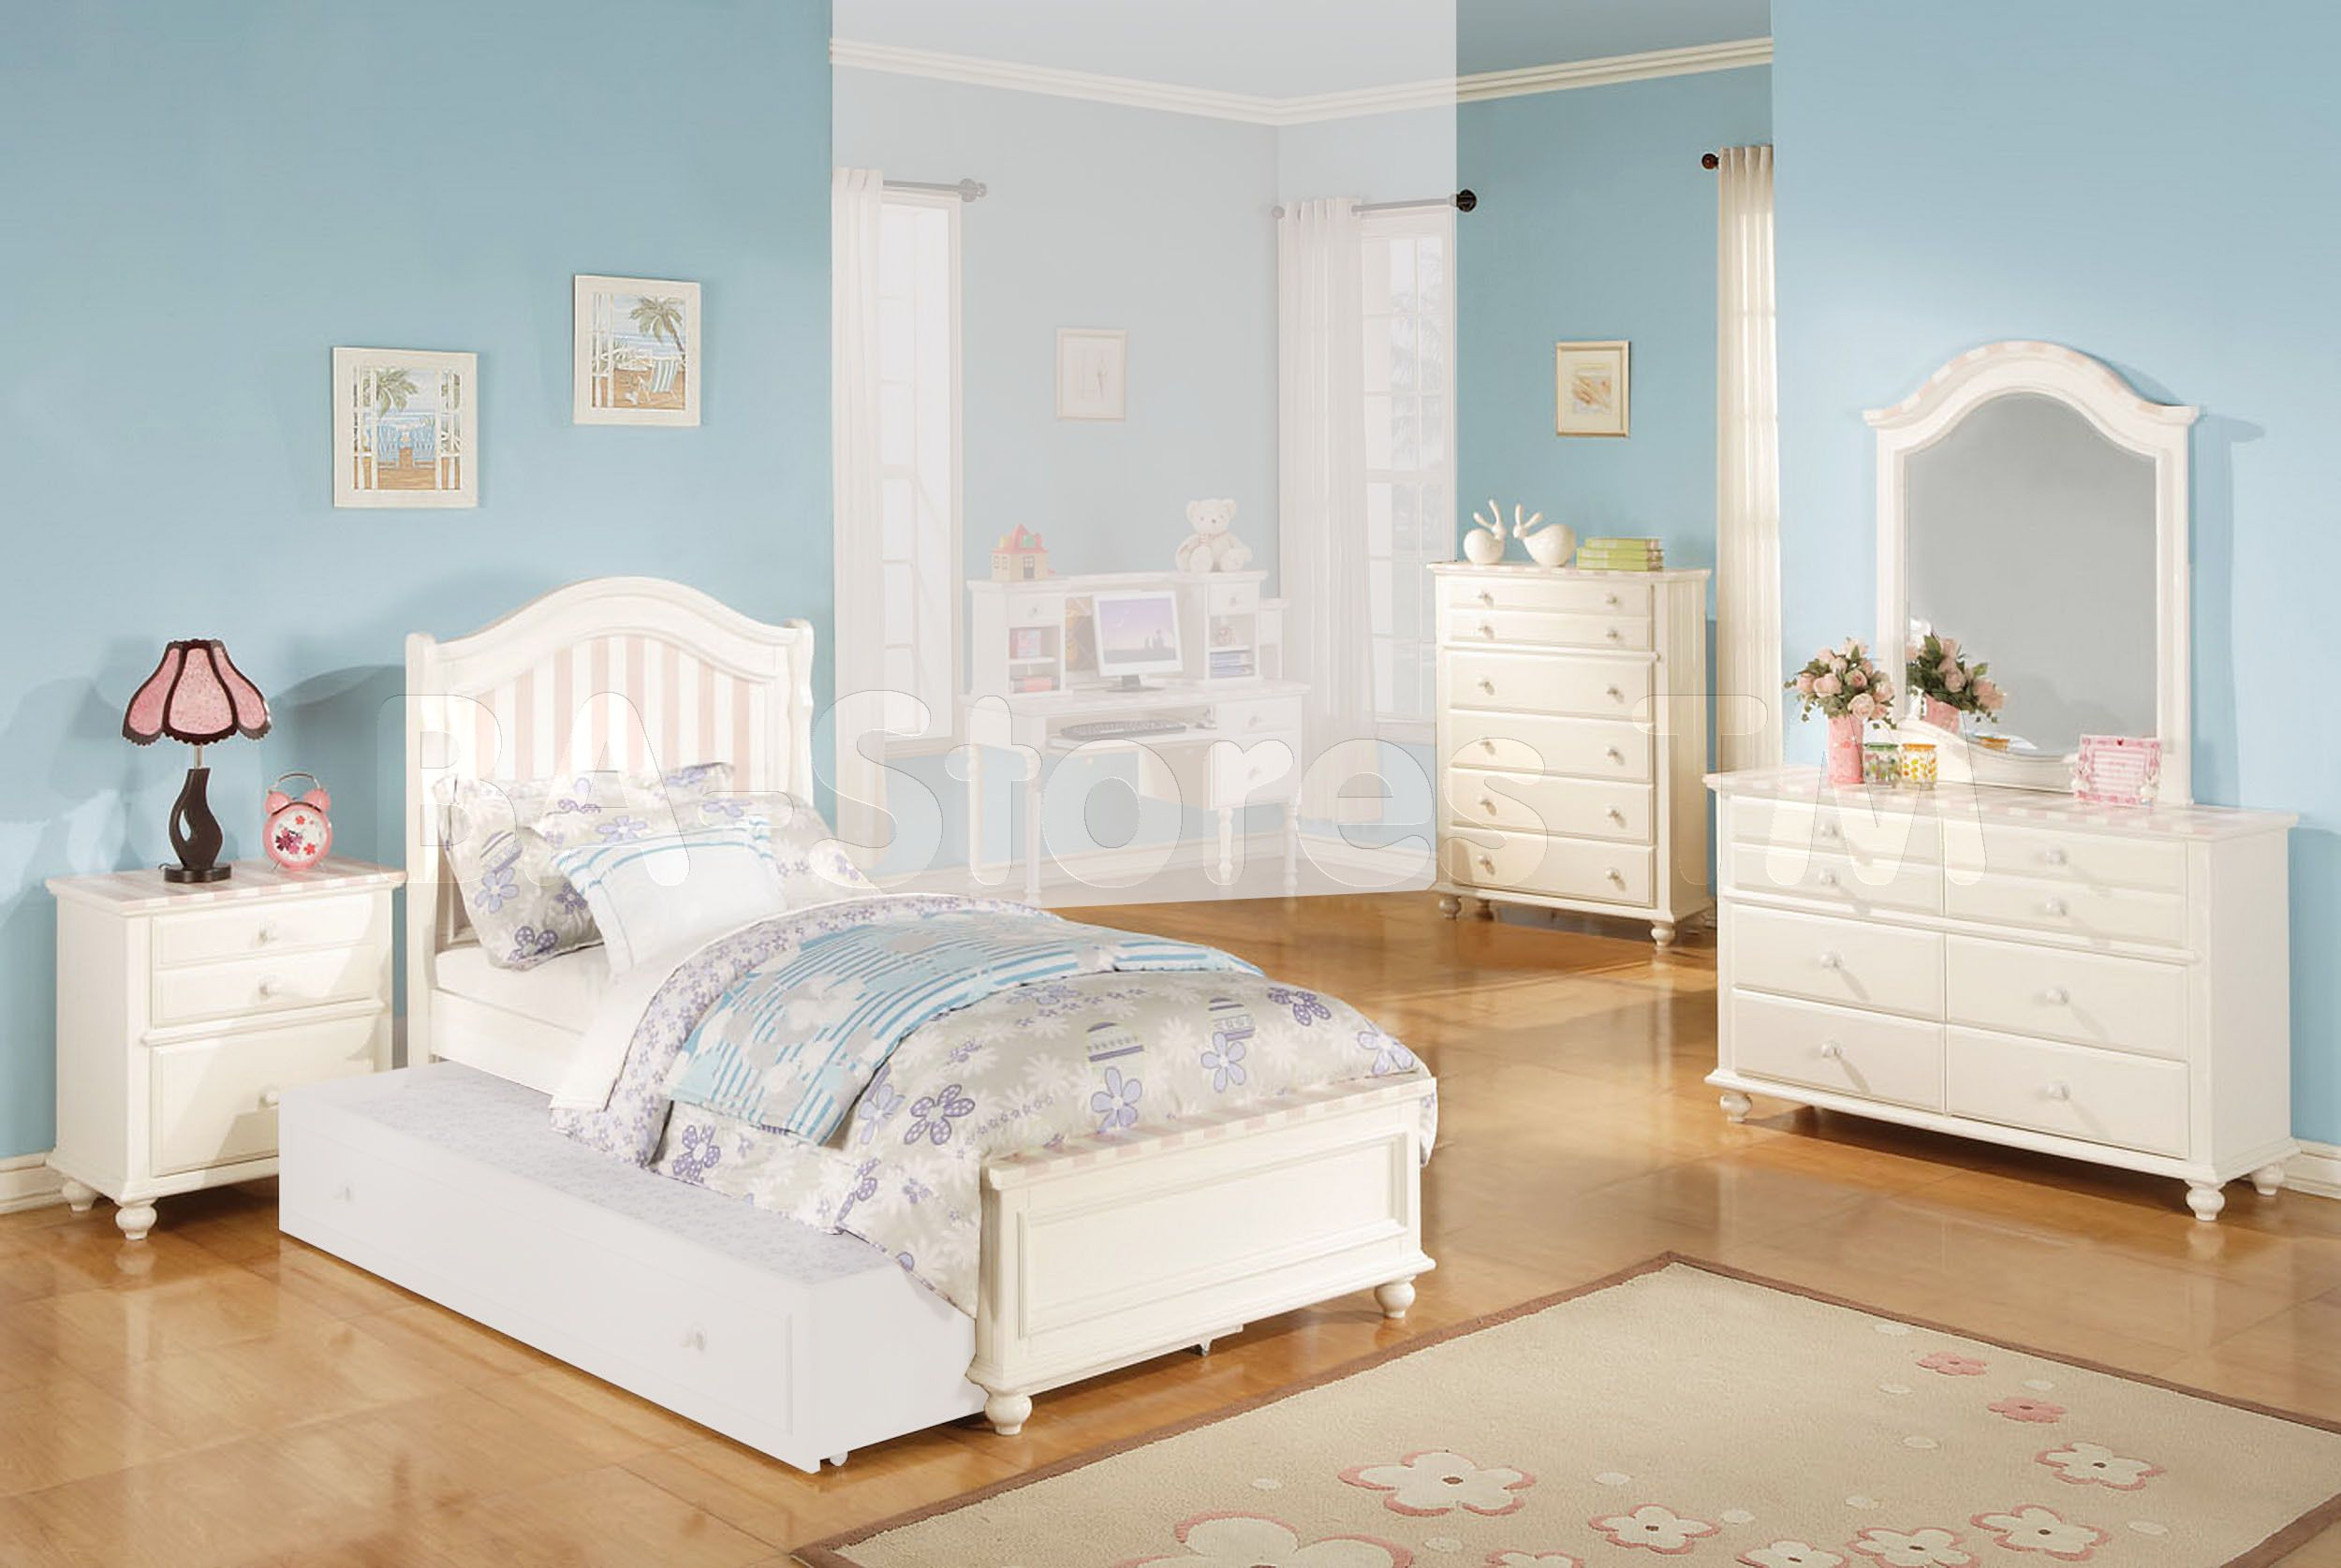 Kids White Bedroom Furniture Benefits Of Using Childrens White Bedroom Set Furniture Childrens Bedroom Furniture Sets Girls Bedroom Furniture Sets